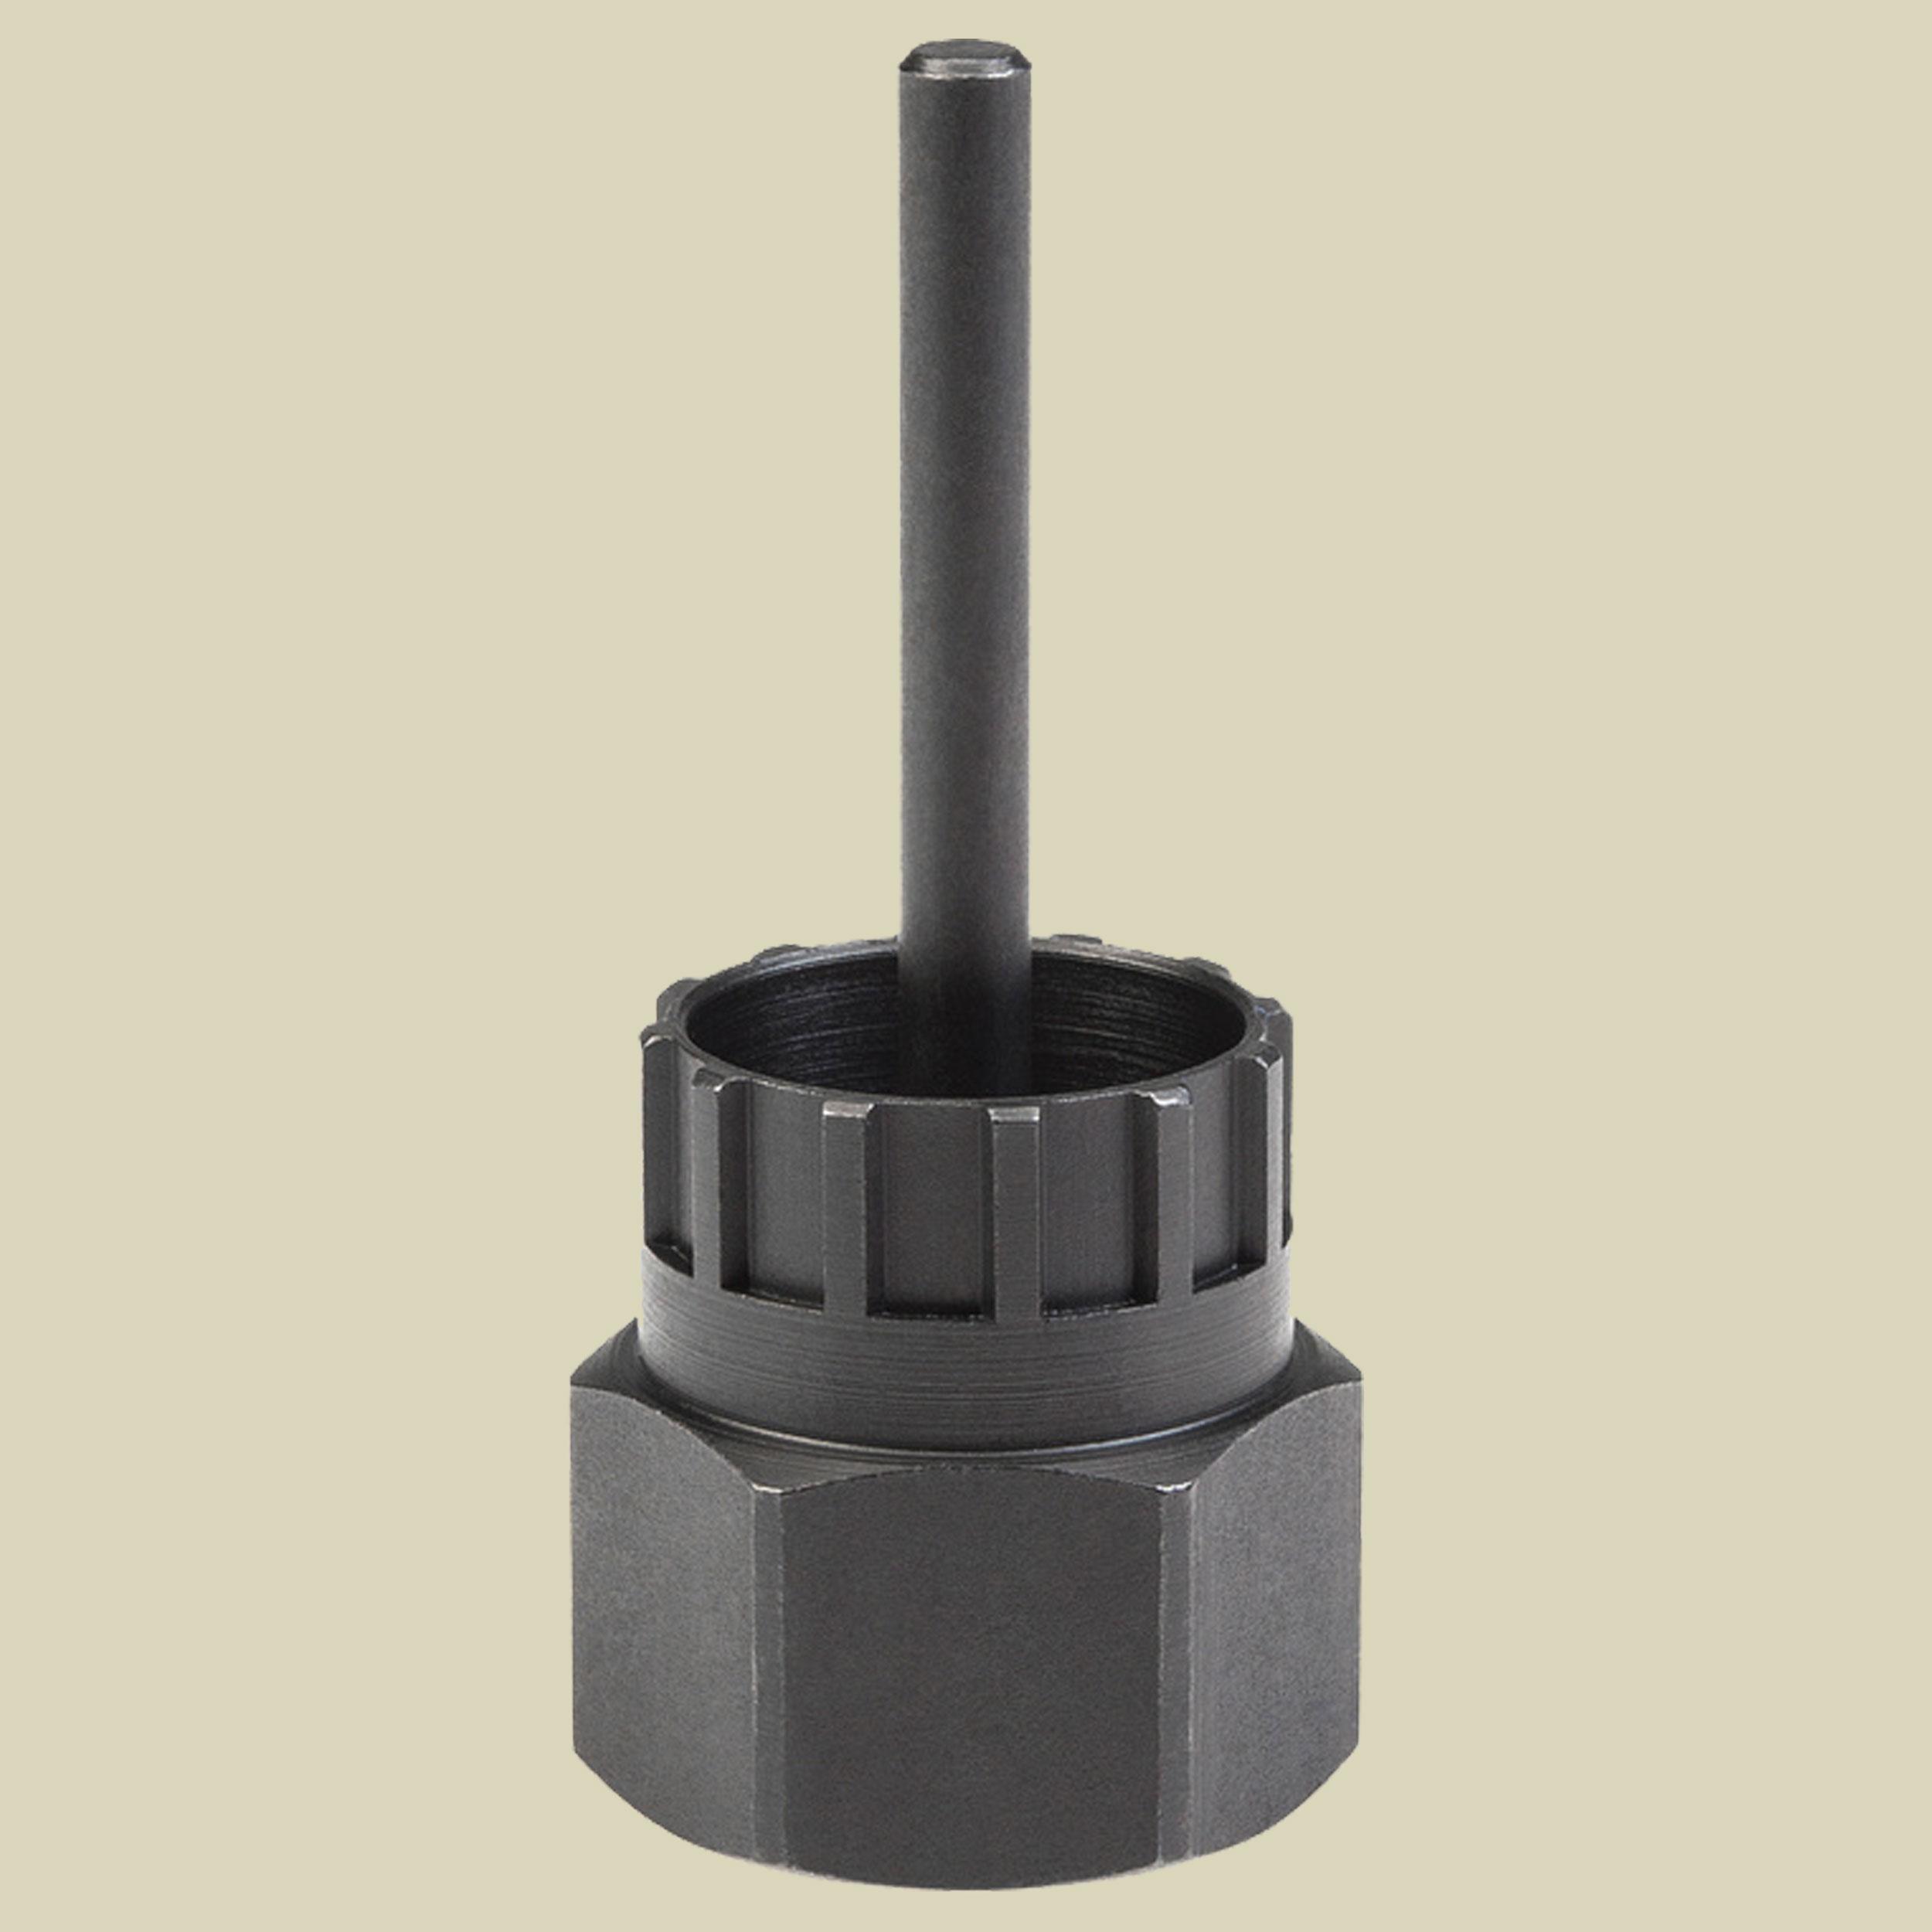 Park Tool FR-5.2G ZK-Abzieher Shimano Kassetten